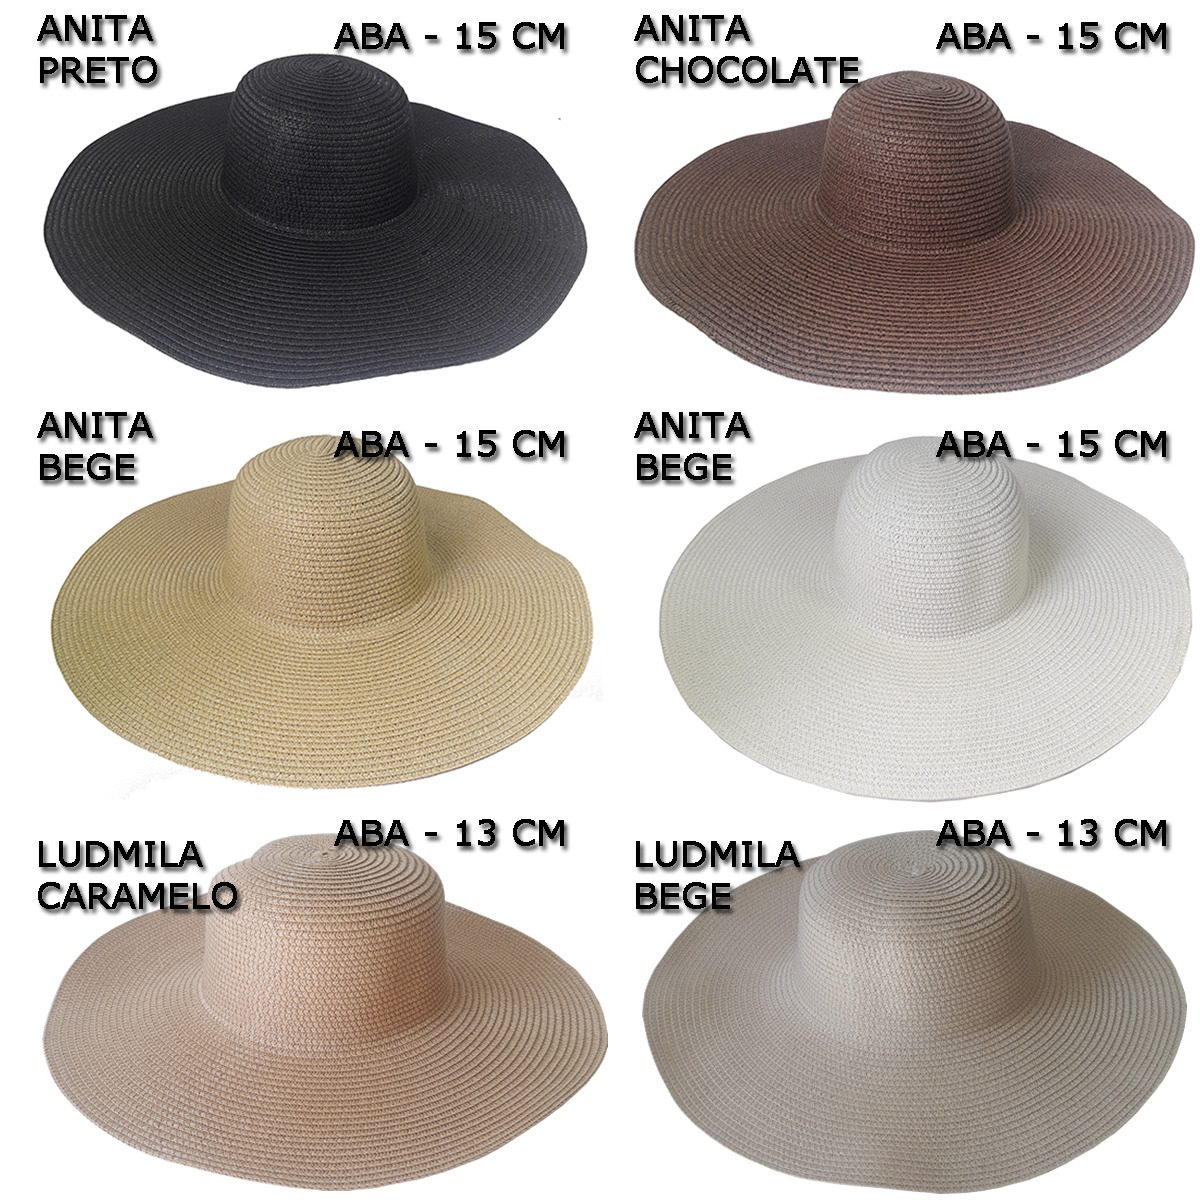 4 chapéu de praia modelo floppy frete gratis varios modelos. Carregando  zoom. 14b38e66b6a